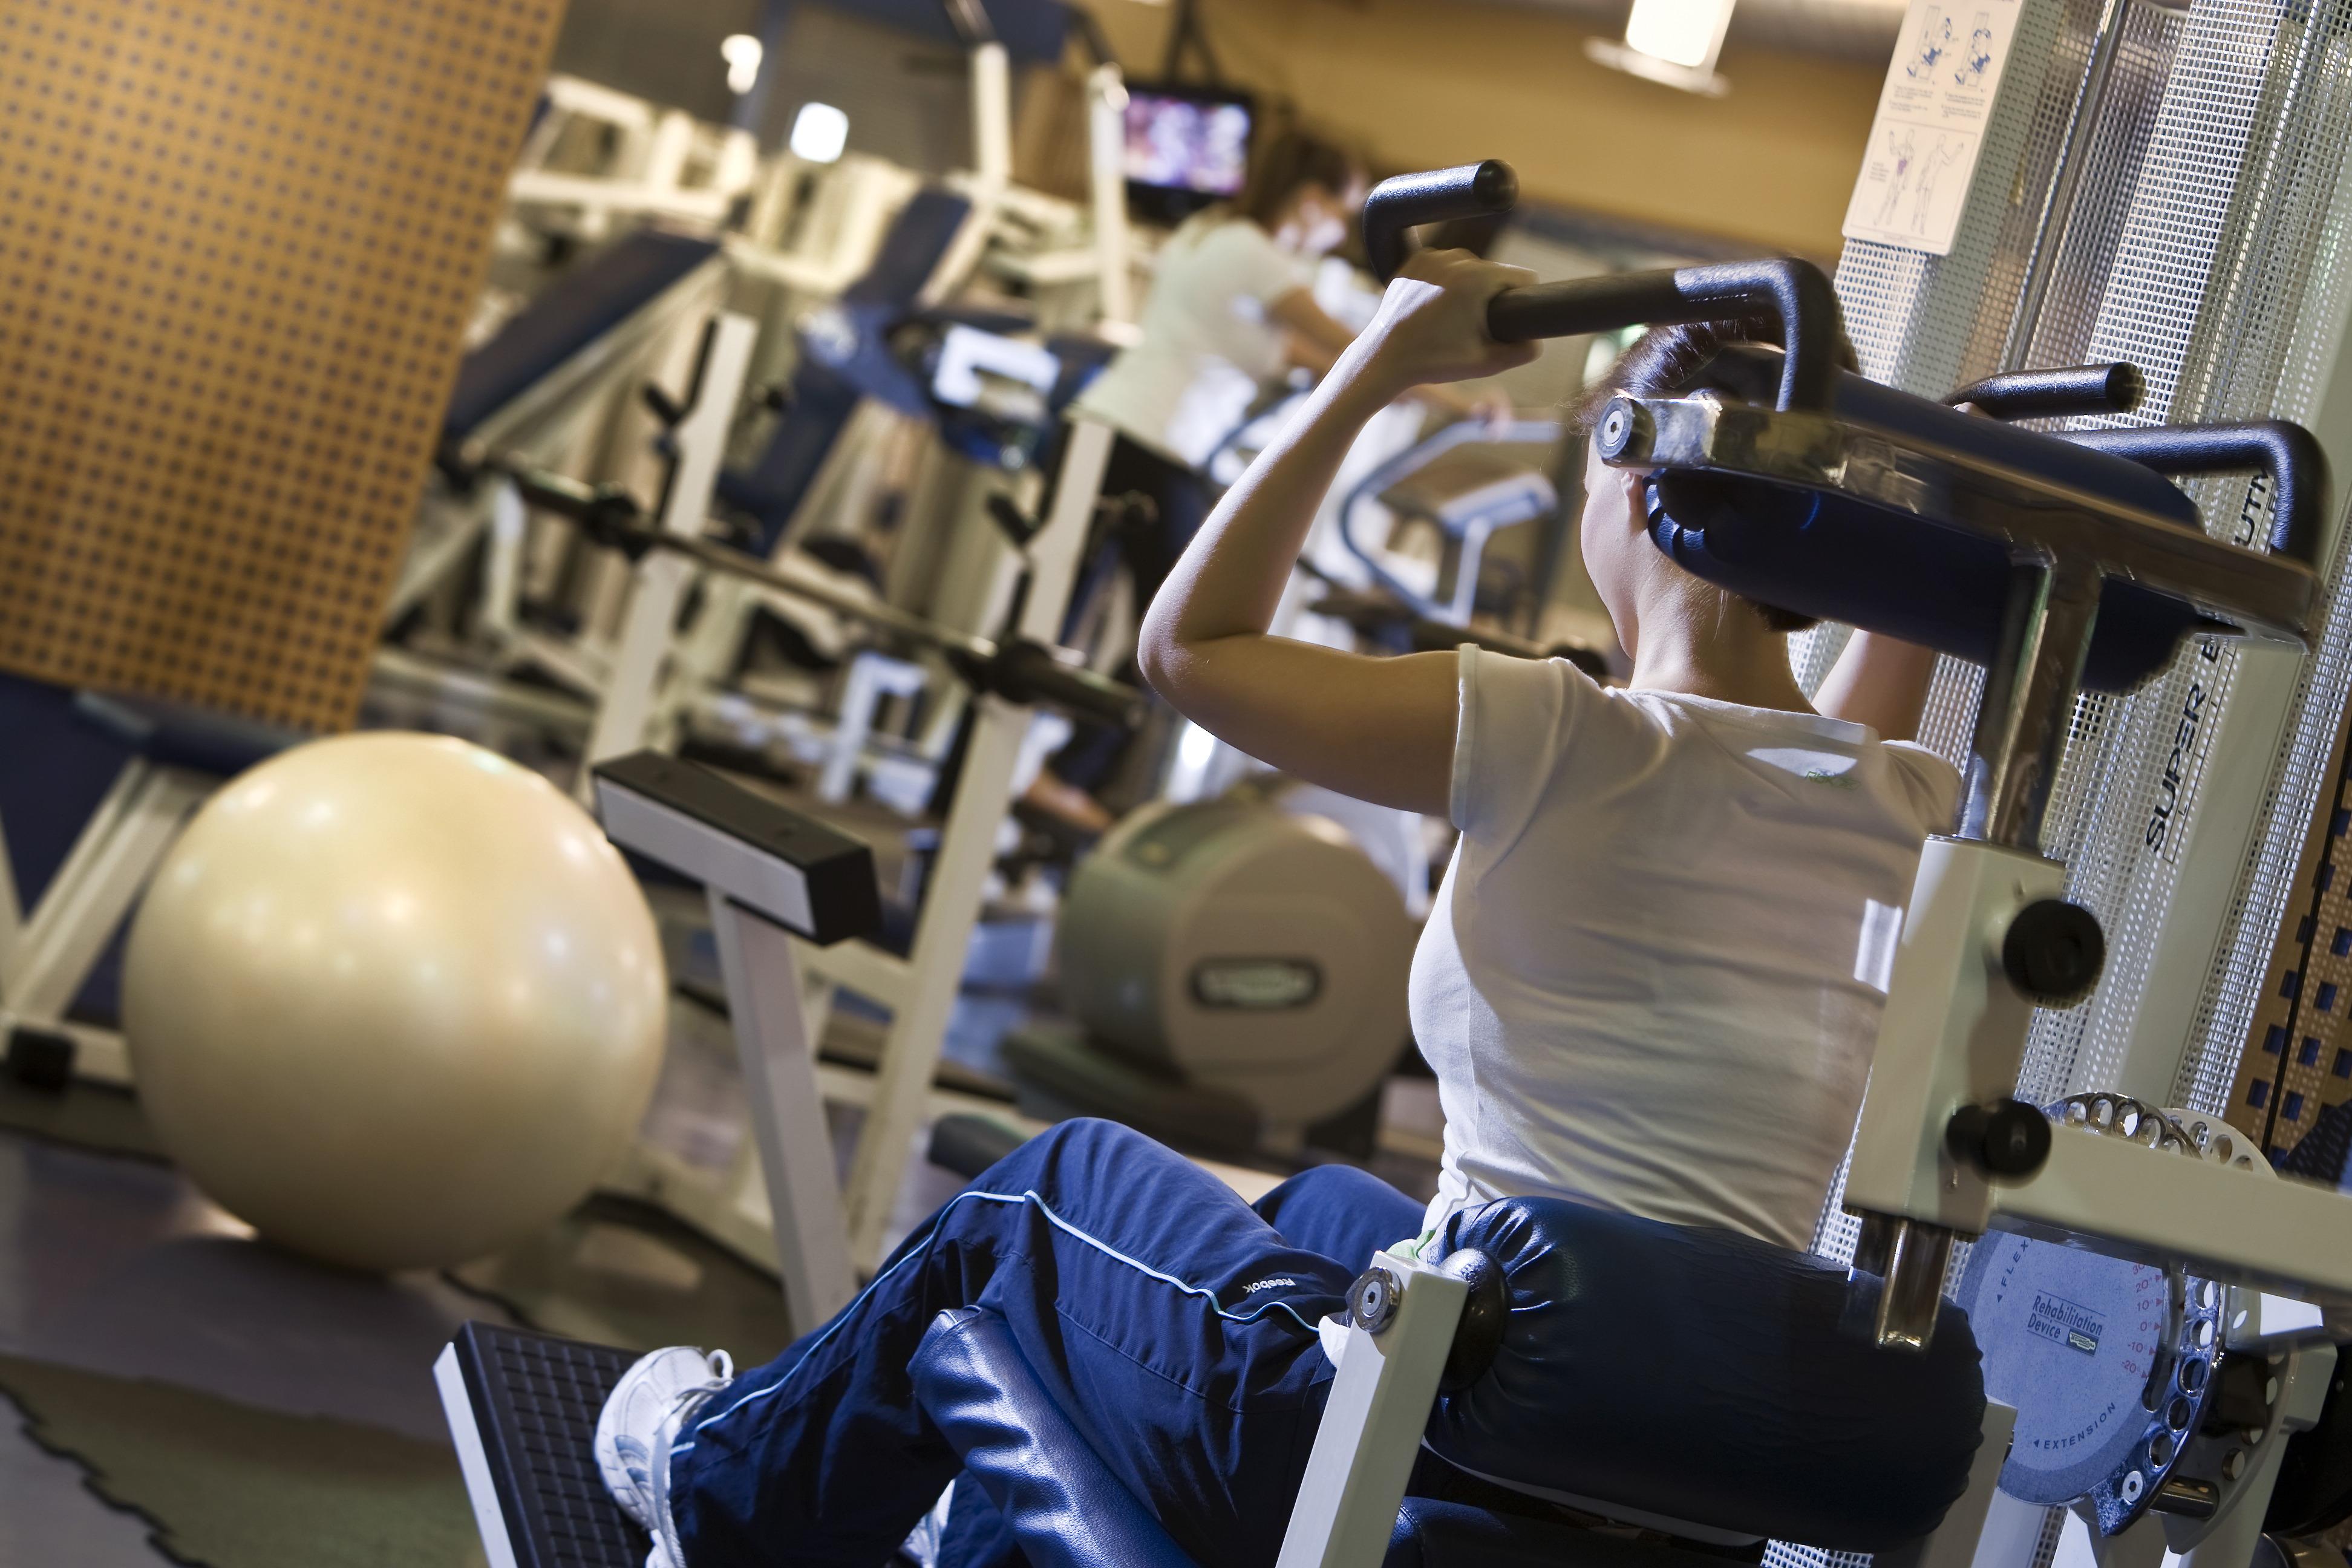 Danubius Premier Fitness edzőterem gépek